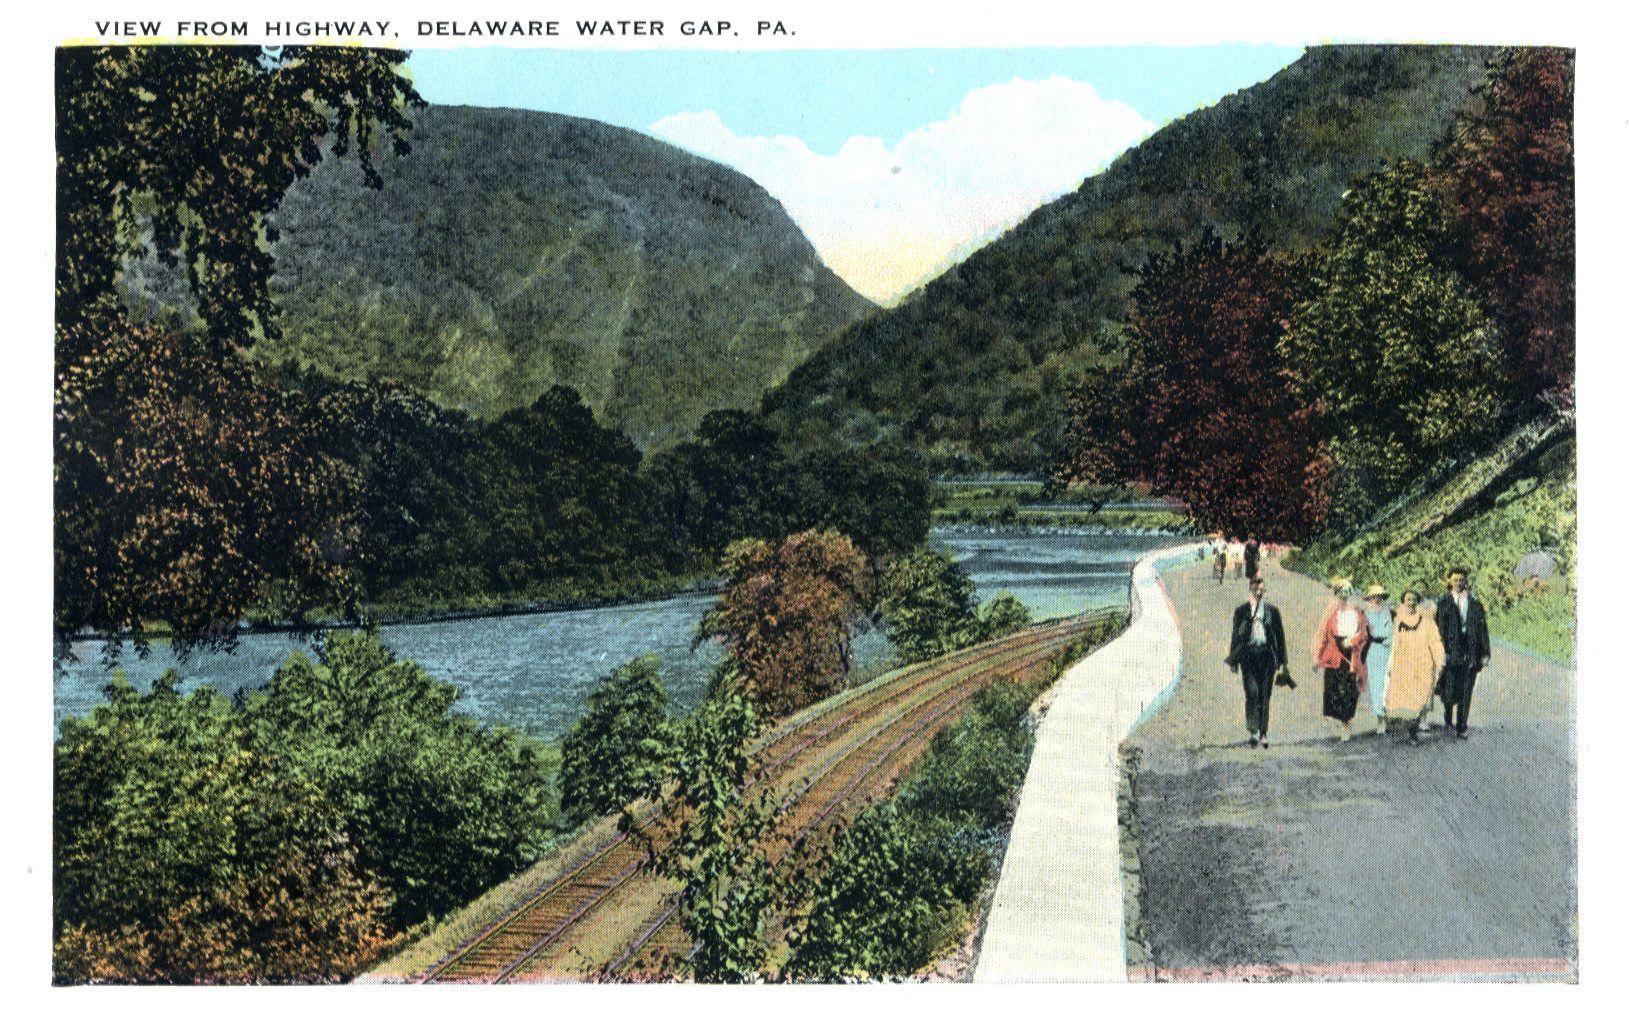 Delaware Water Gap Postcards | Philadelphia Trolley Tracks: Delaware Water Gap postcards